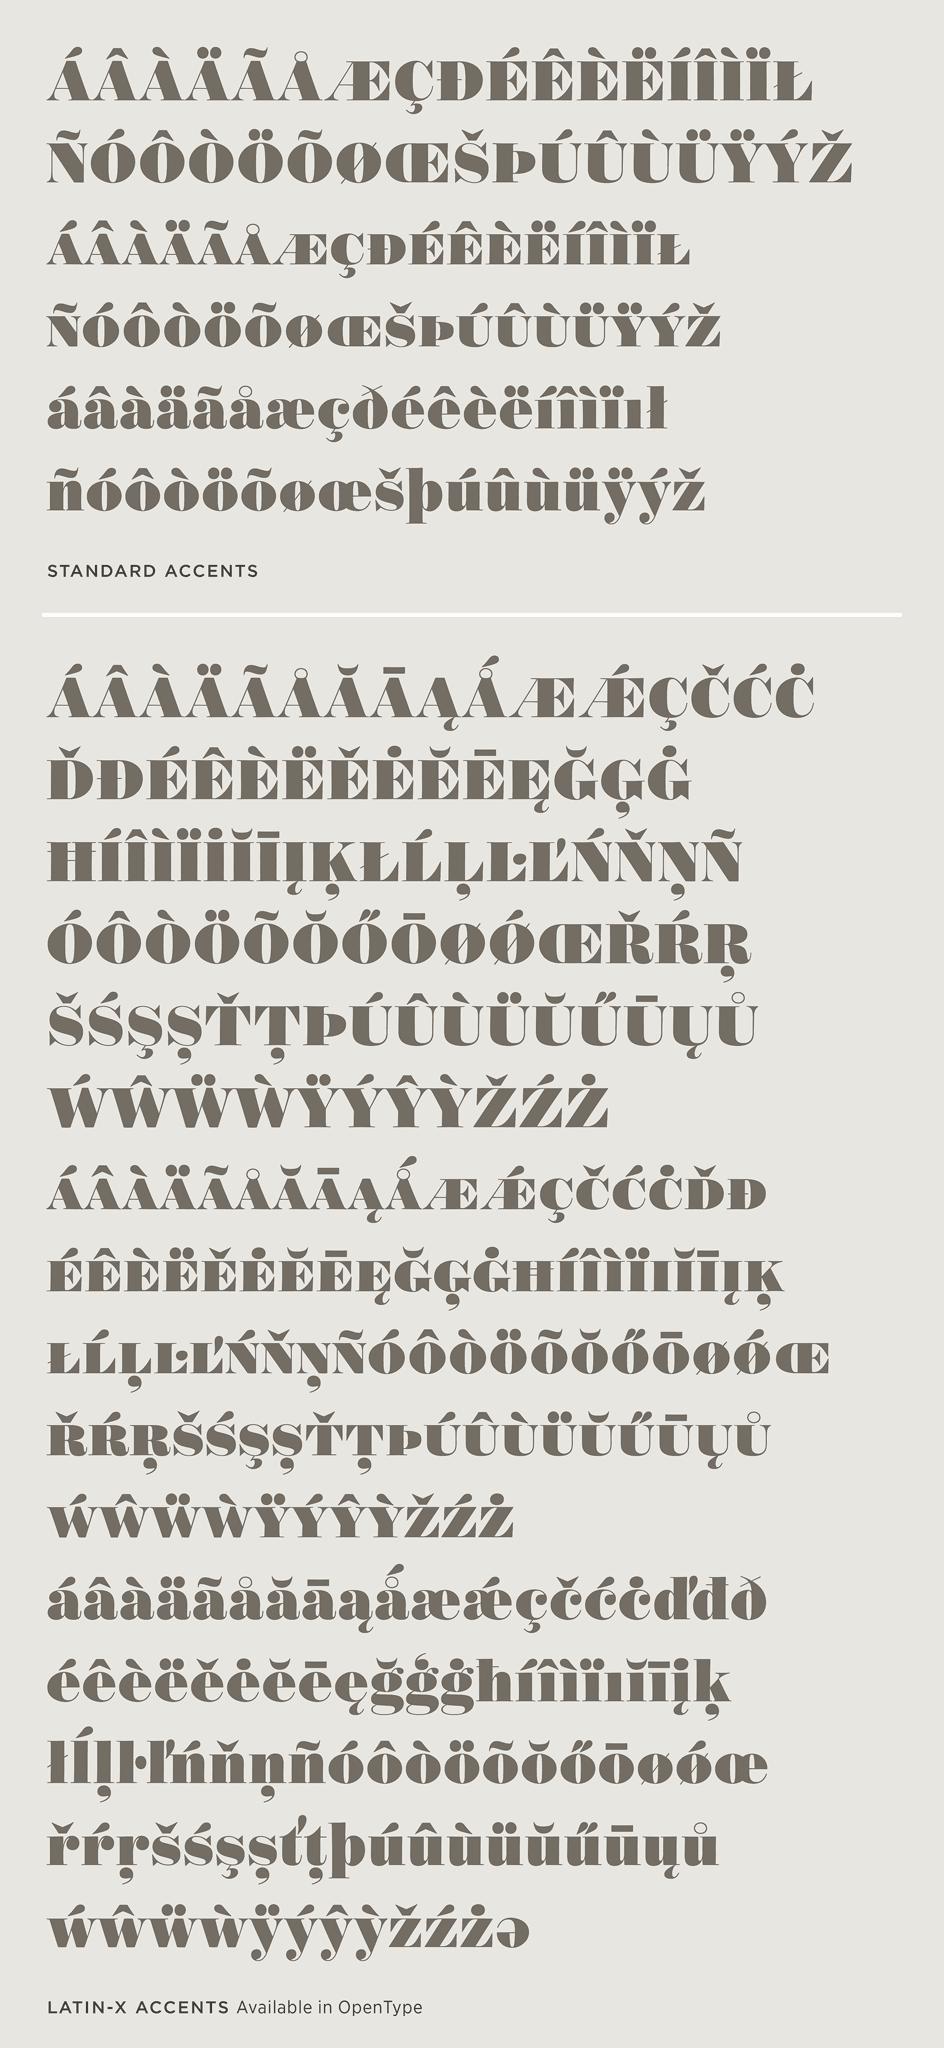 Obsidian: Latin-X Character Set